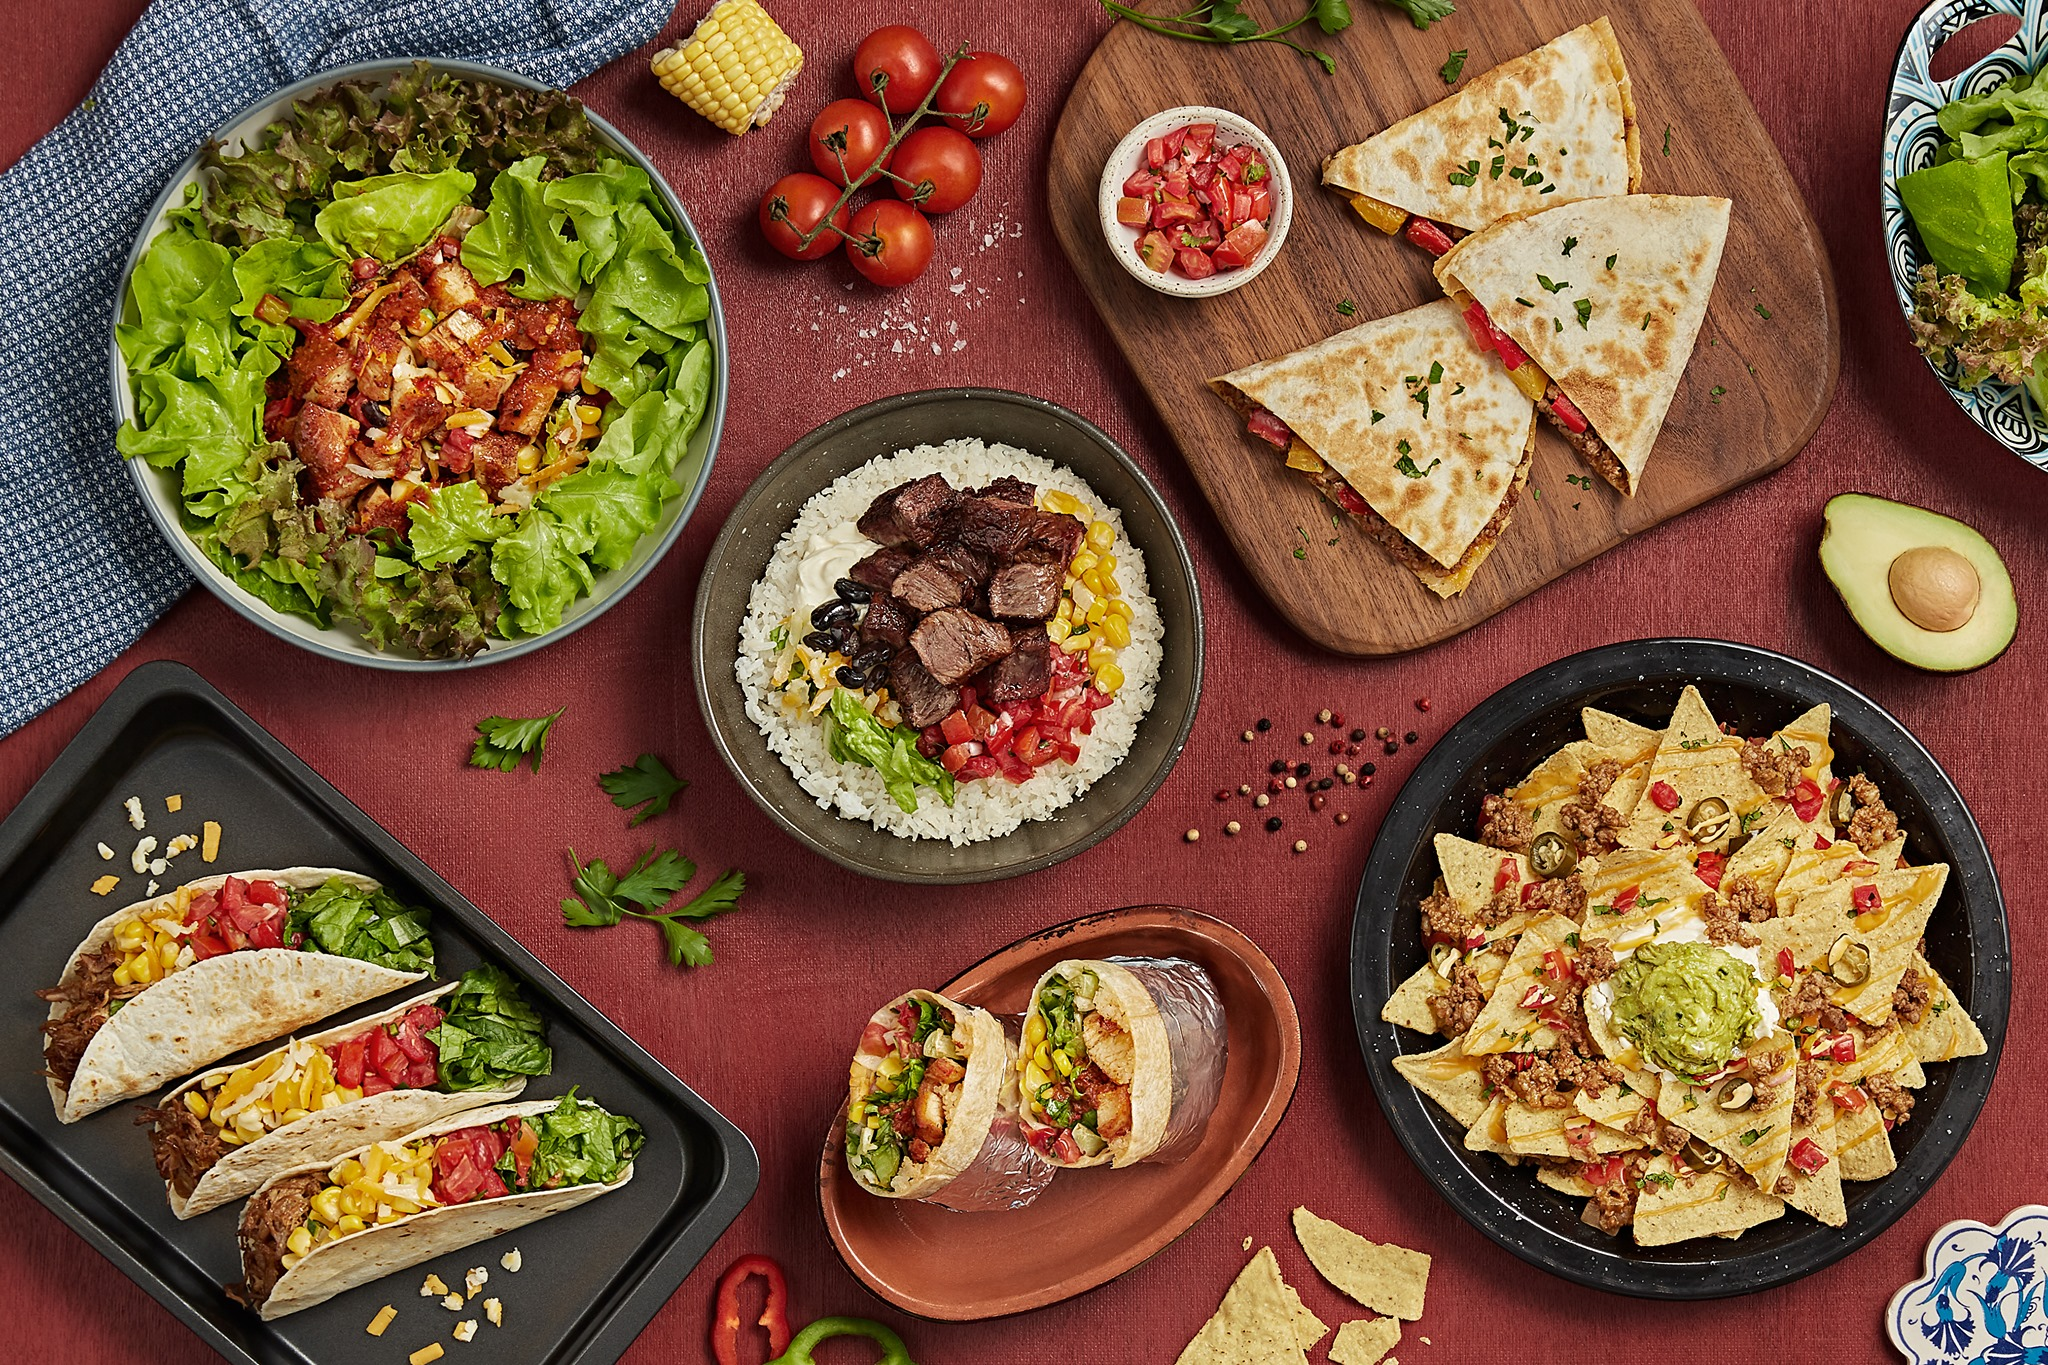 Bowlito Mexican Kitchen Menu